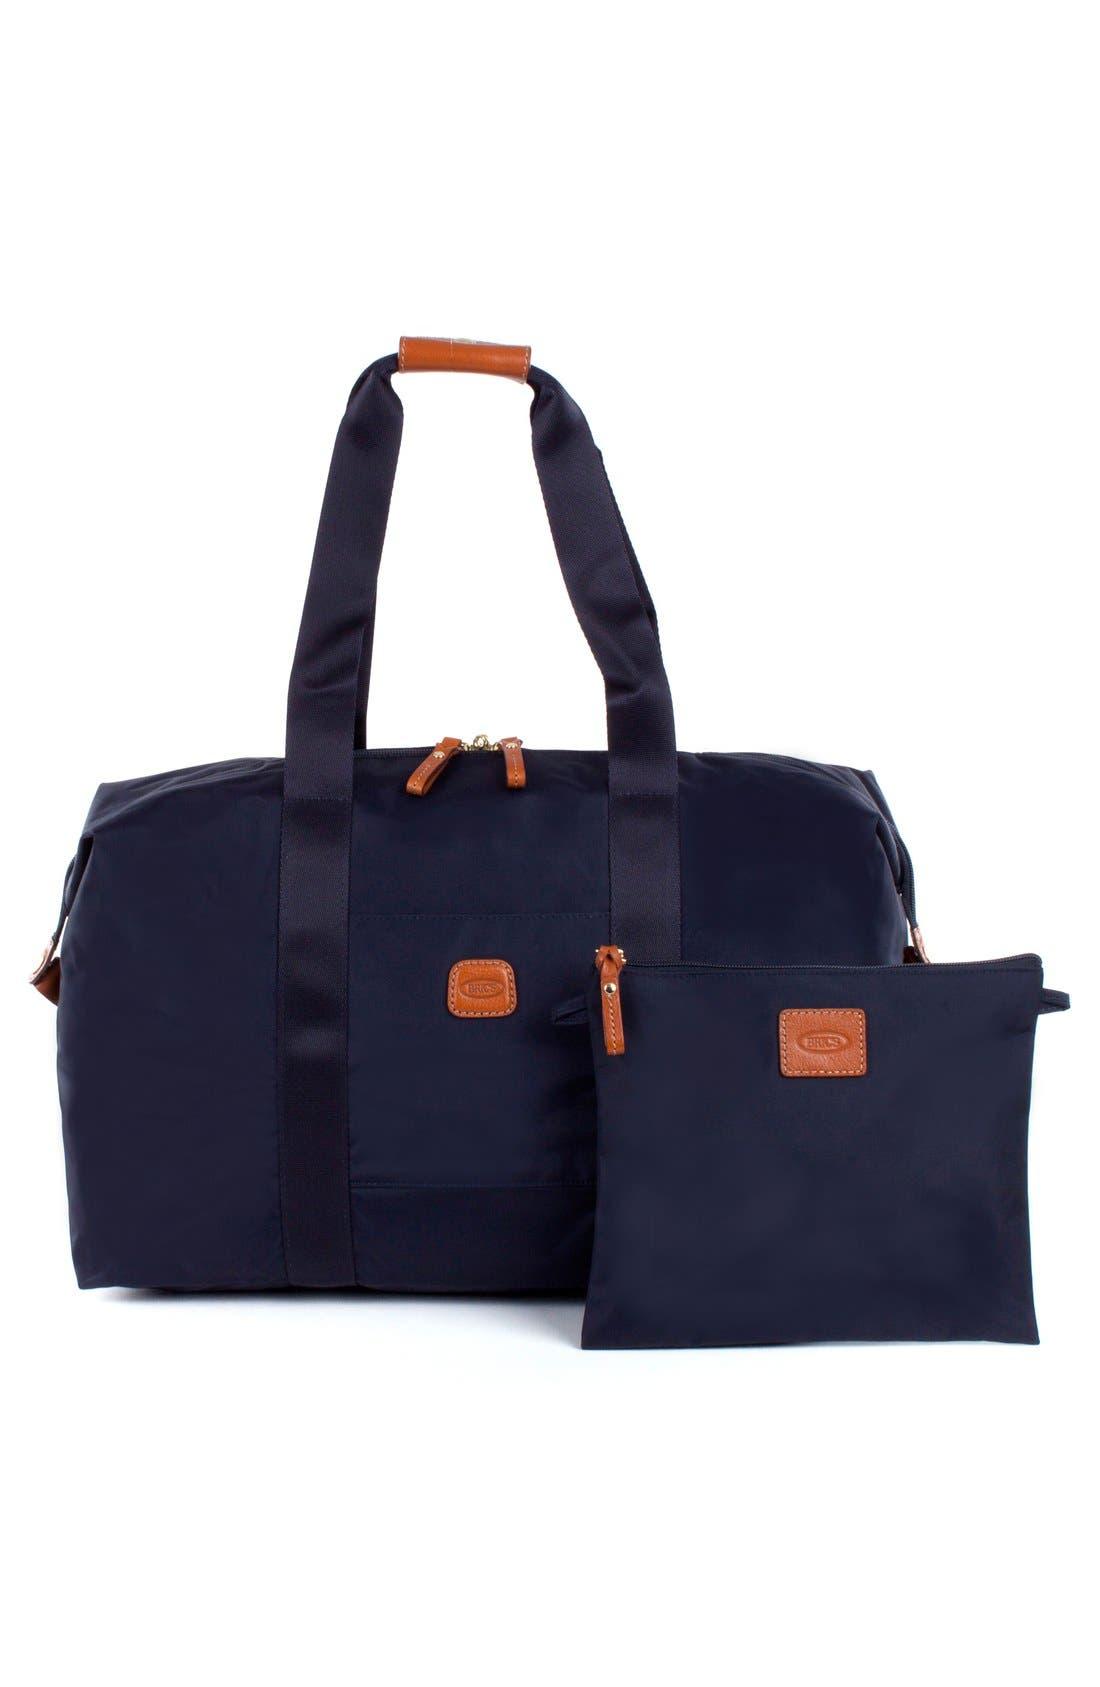 'X-Bag' Folding Duffel Bag,                             Alternate thumbnail 3, color,                             410